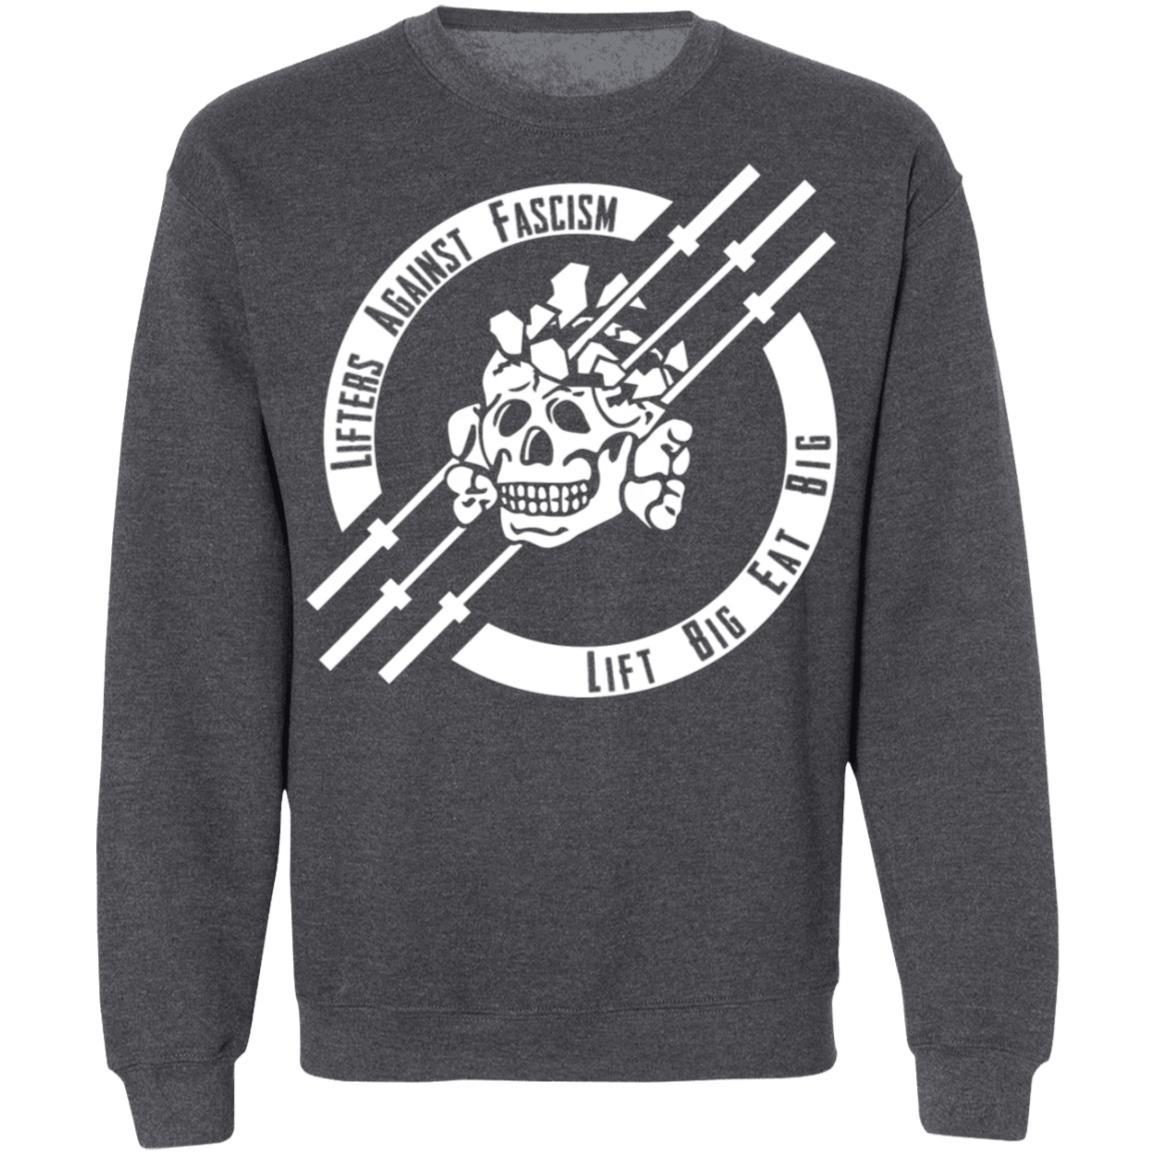 G180 Crewneck Pullover Sweatshirt 8 oz.